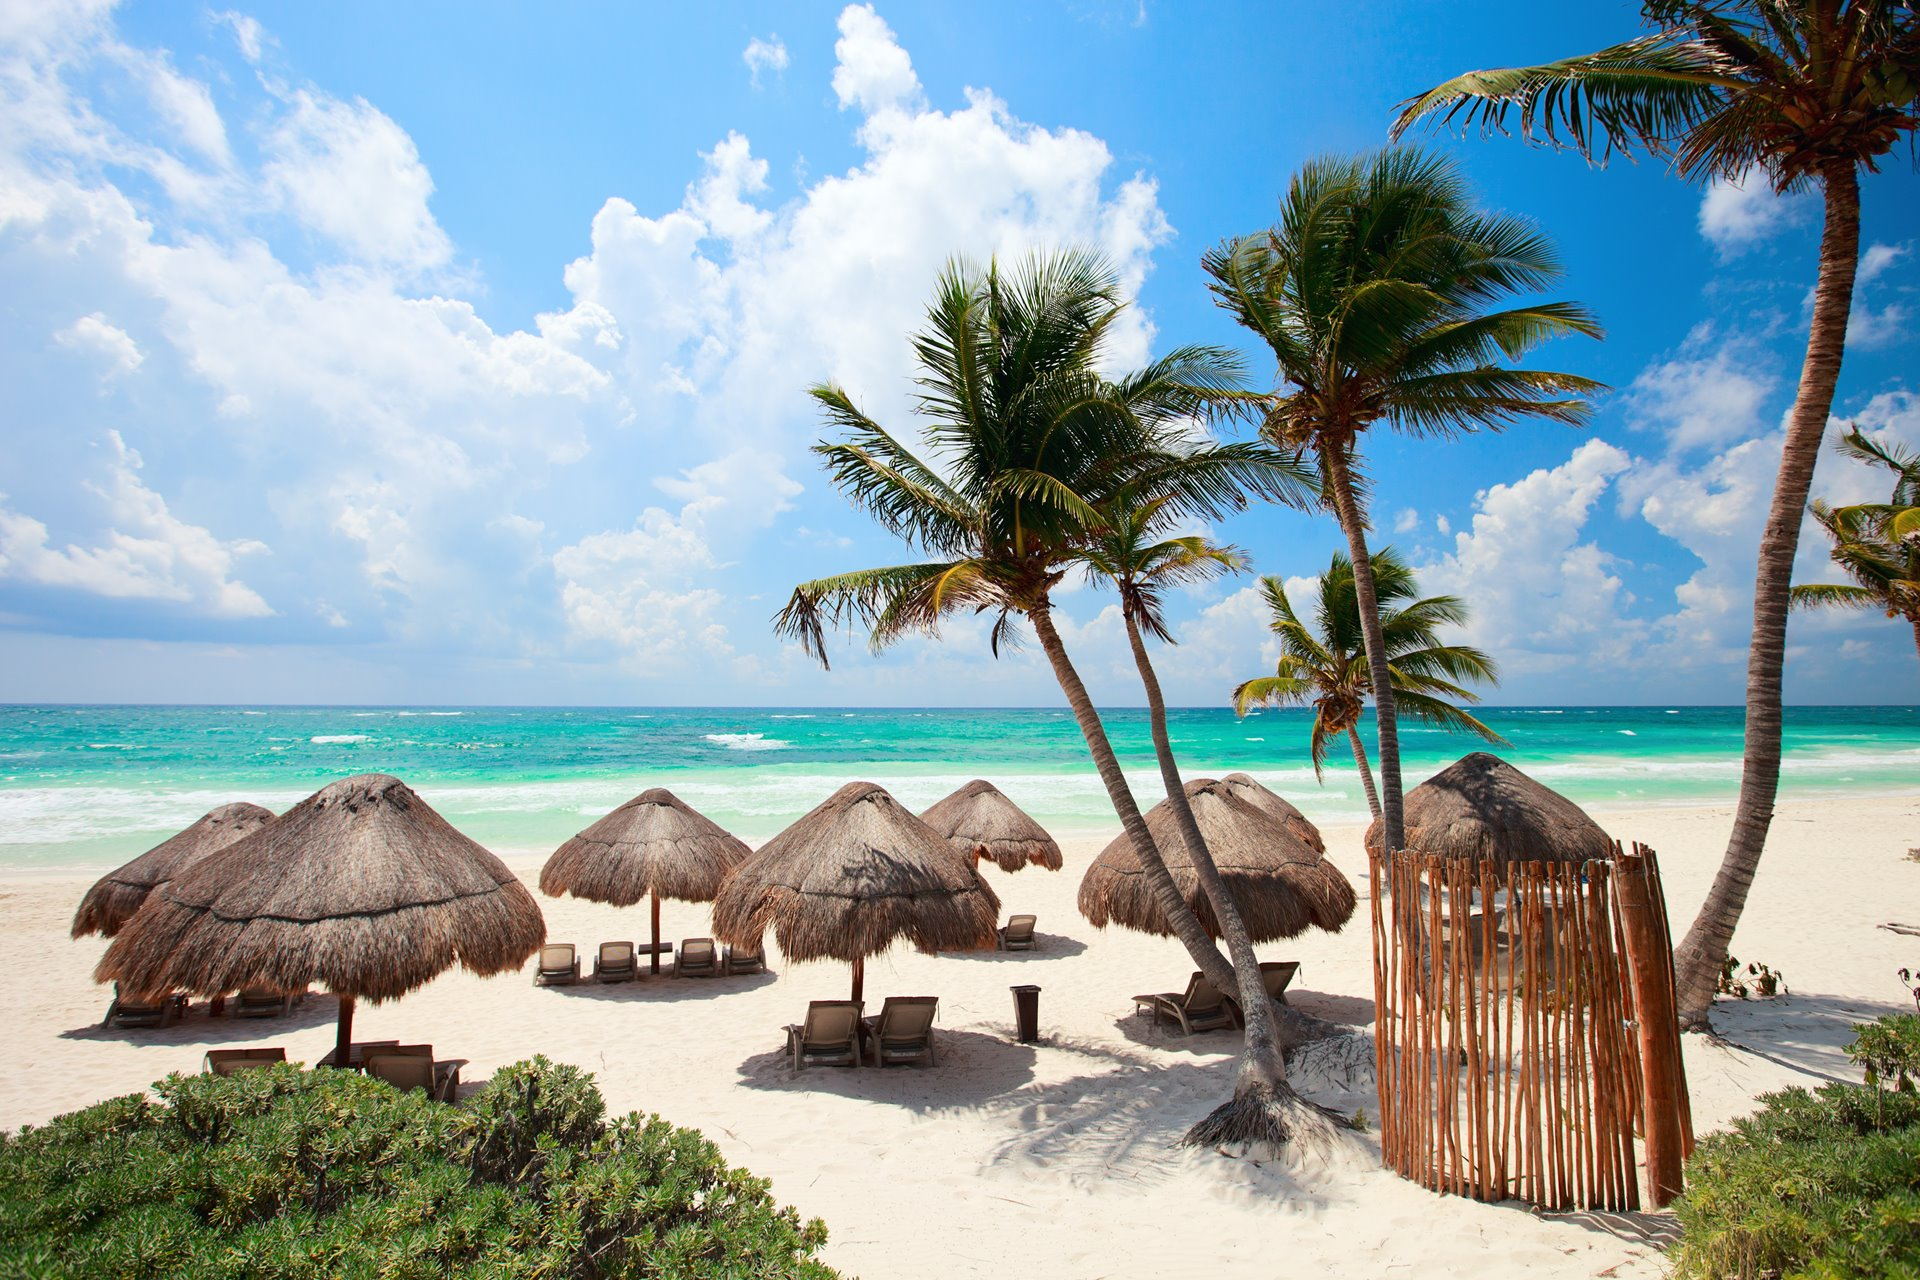 Tulum, a stylish beach destination